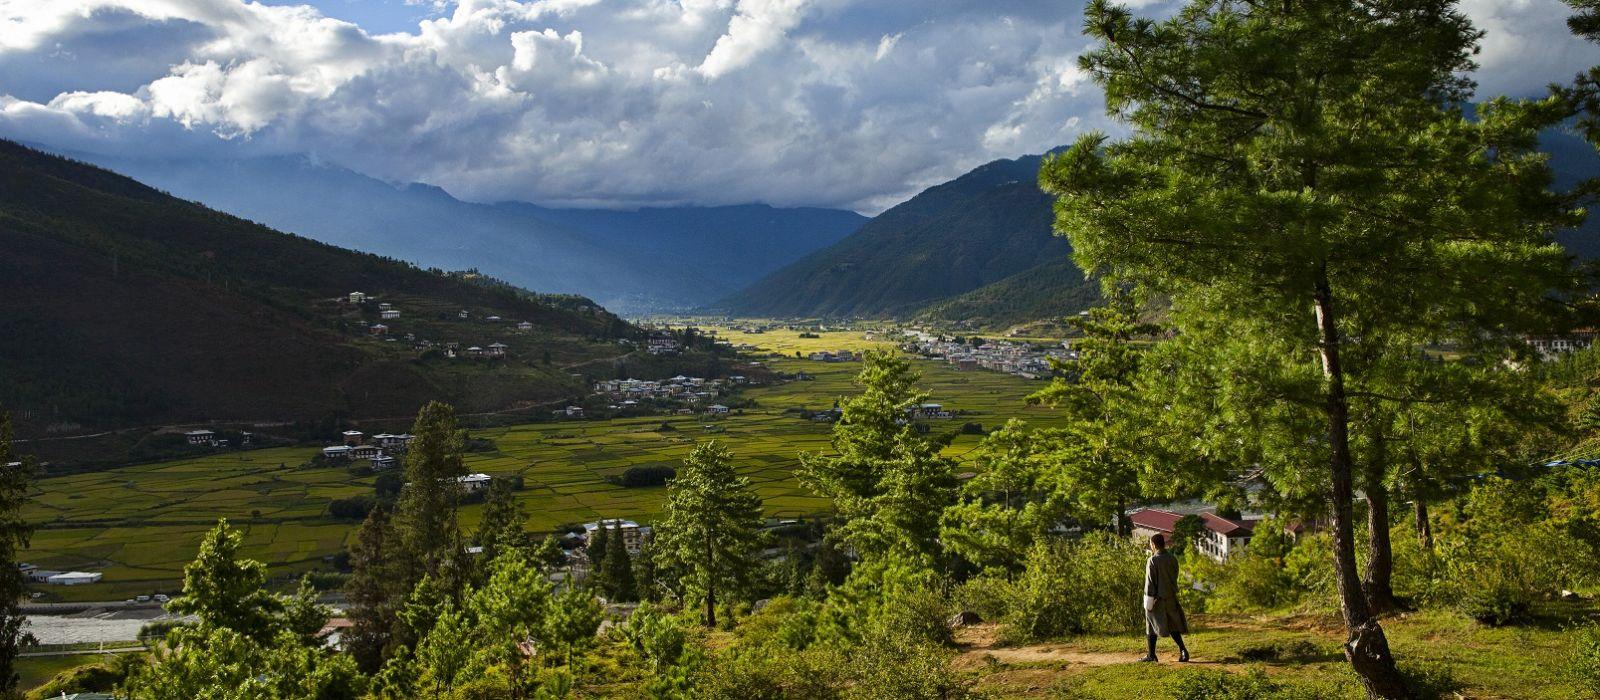 Amankora Exklusivangebot: Luxuriöses Bhutan Urlaub 3